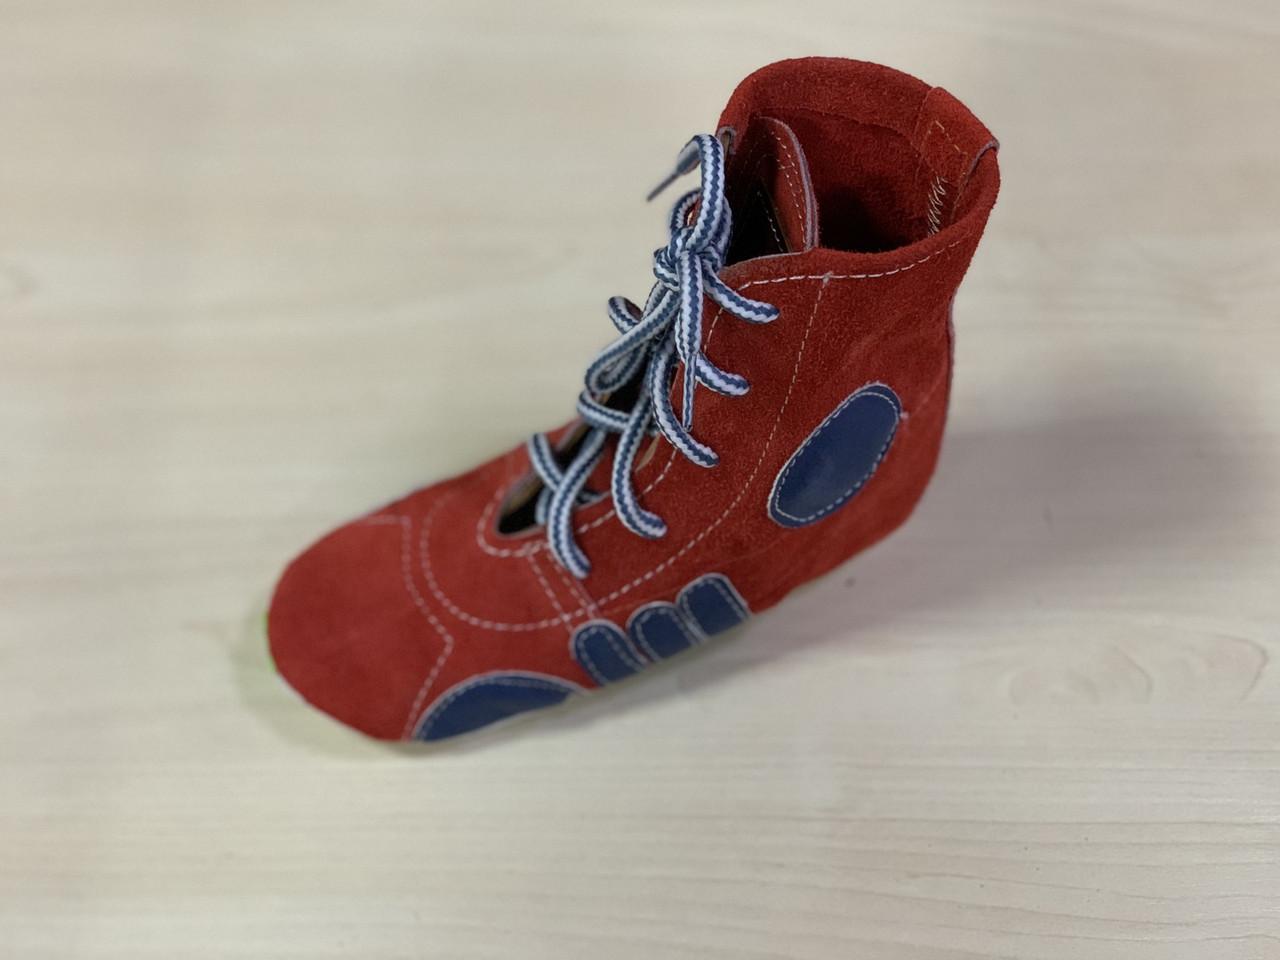 Борцовки Лерман красные с синими вставками подошва замш р.32